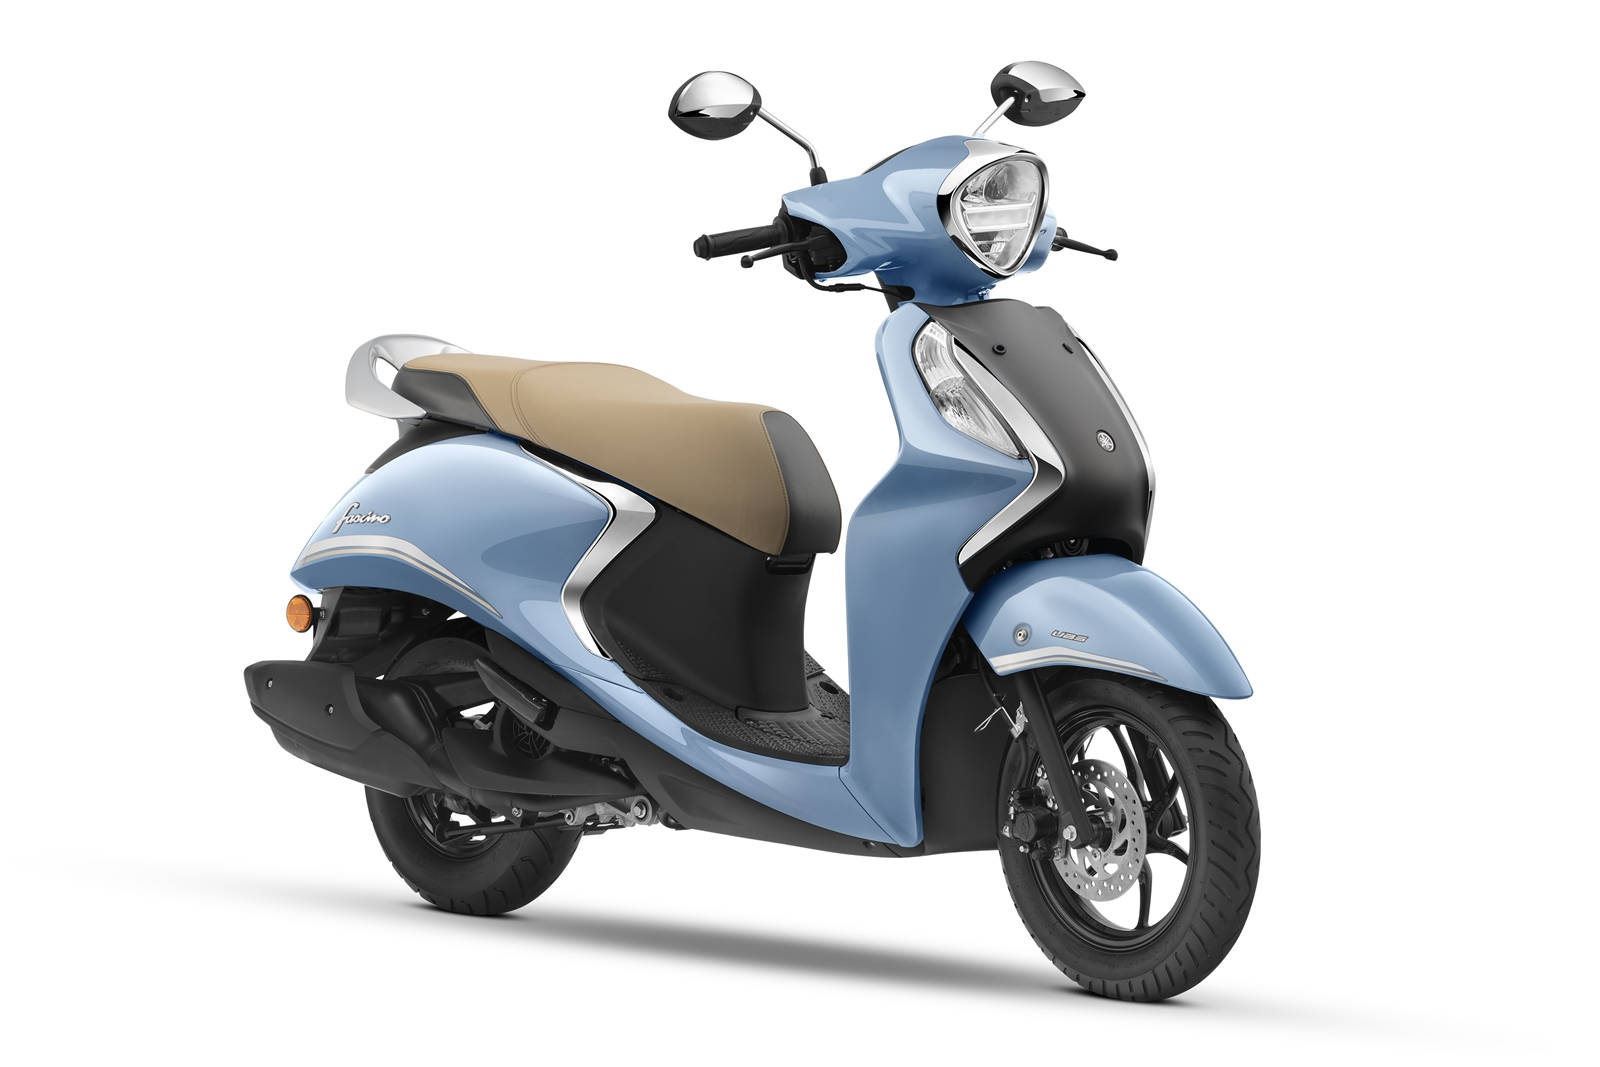 Yamaha Fascino 125 Fi Hybrid cool blue metallic colour option